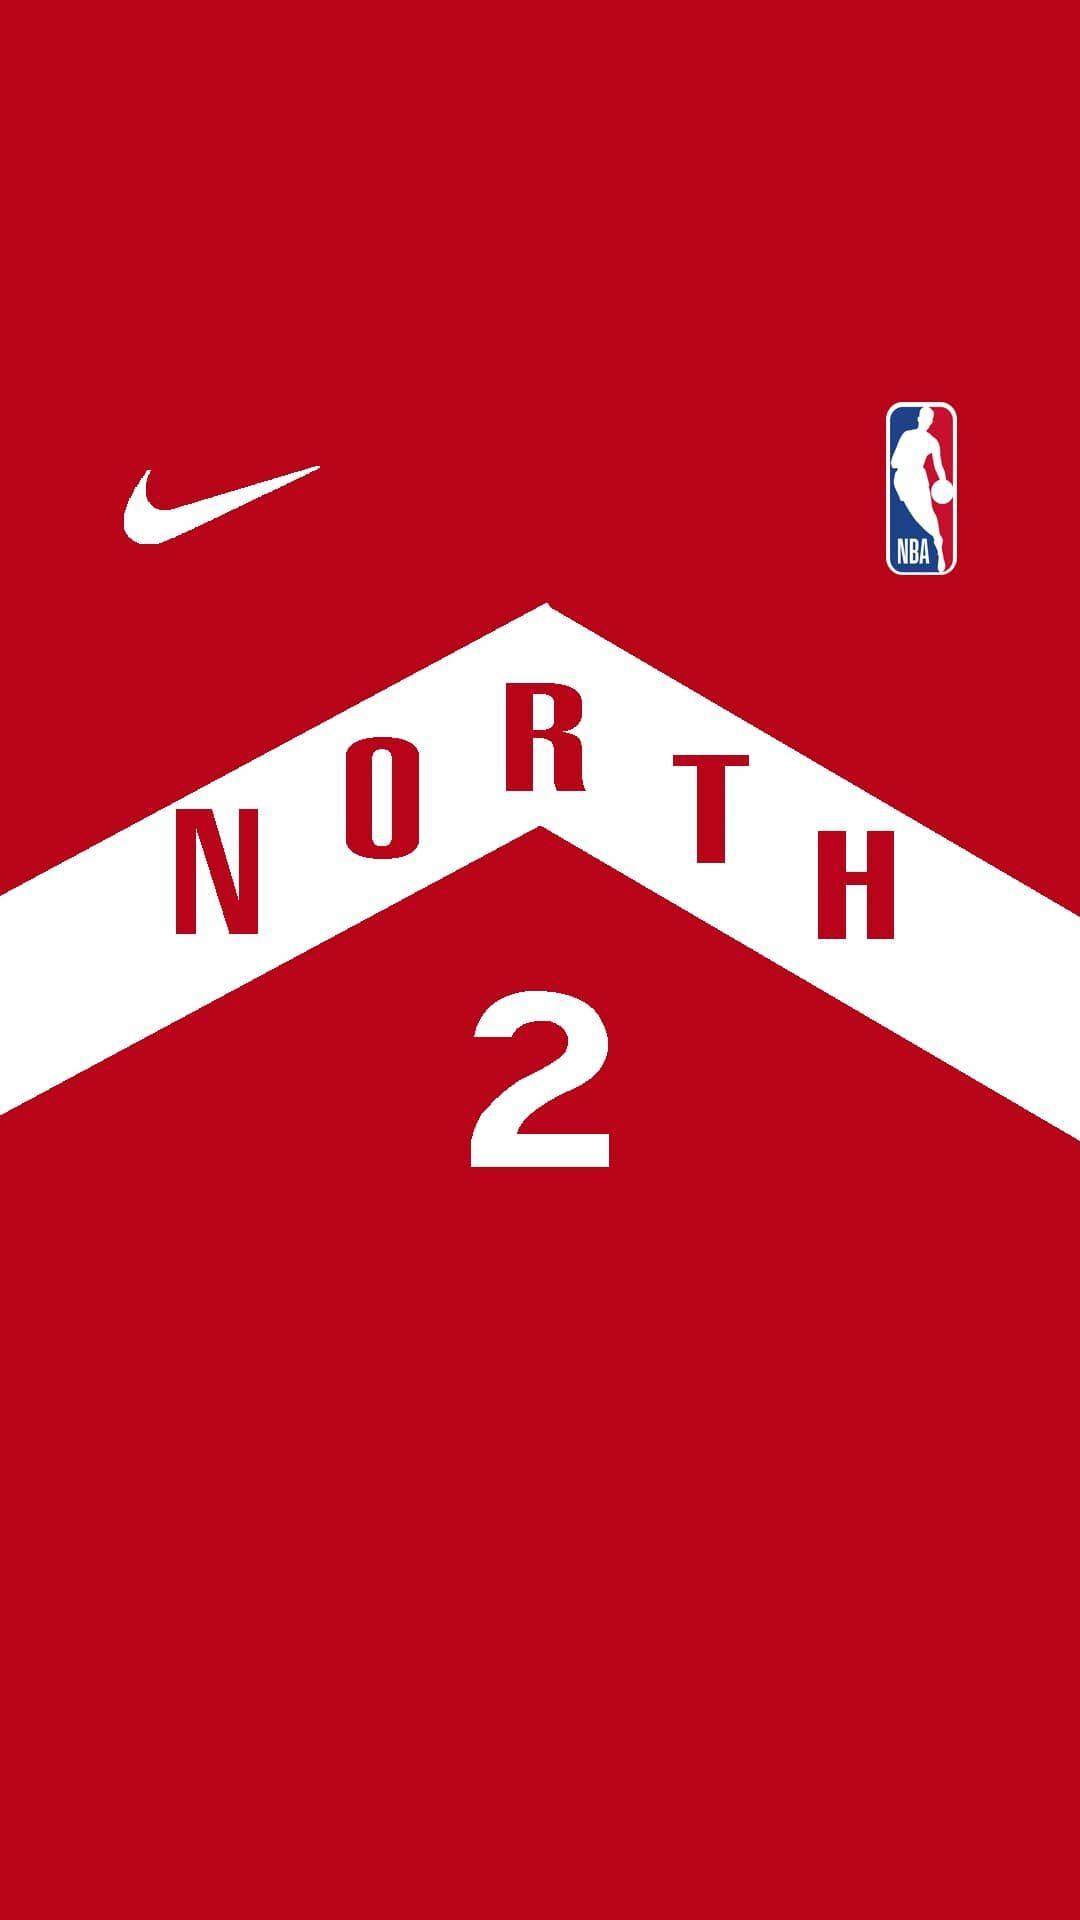 Raptors Kawhi Raptors Basketball Nba Basketball Art Toronto Raptors Basketball